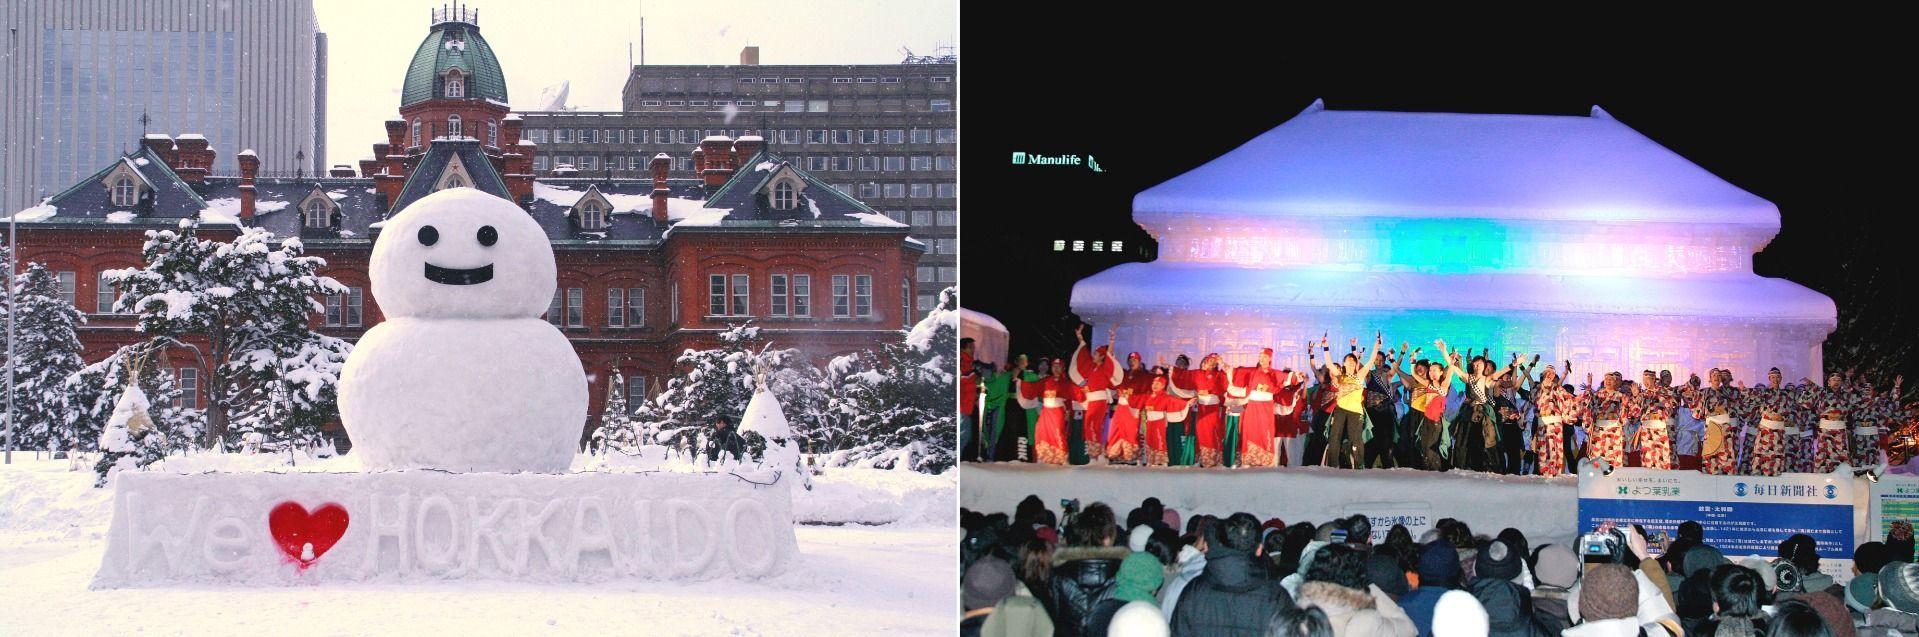 Hokkaido Sapporo Snow festivals